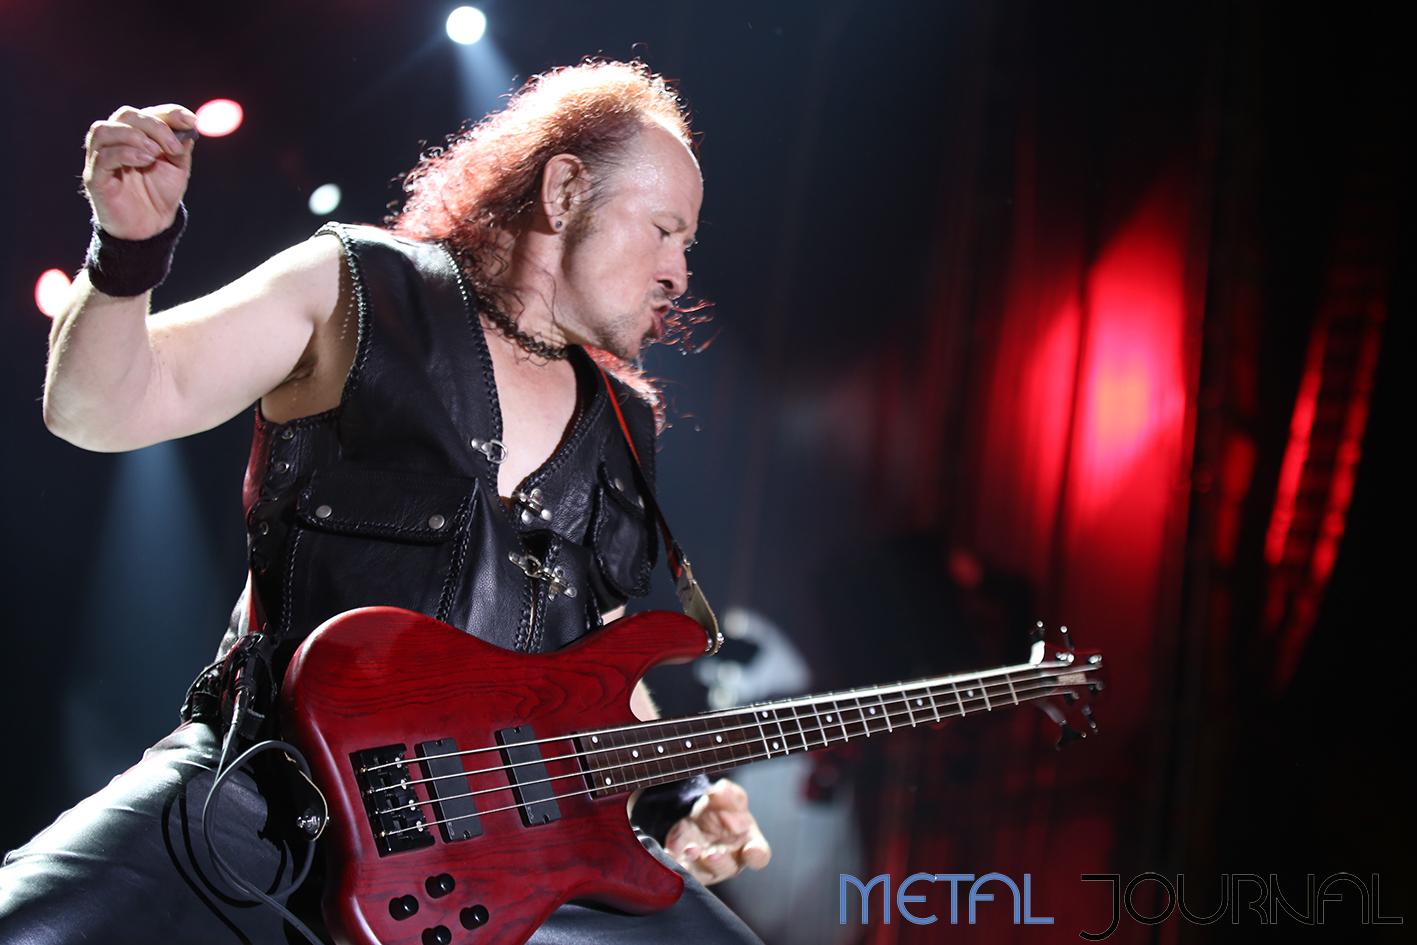 venom - metal journal rock fest barcelona 2019 pic 7